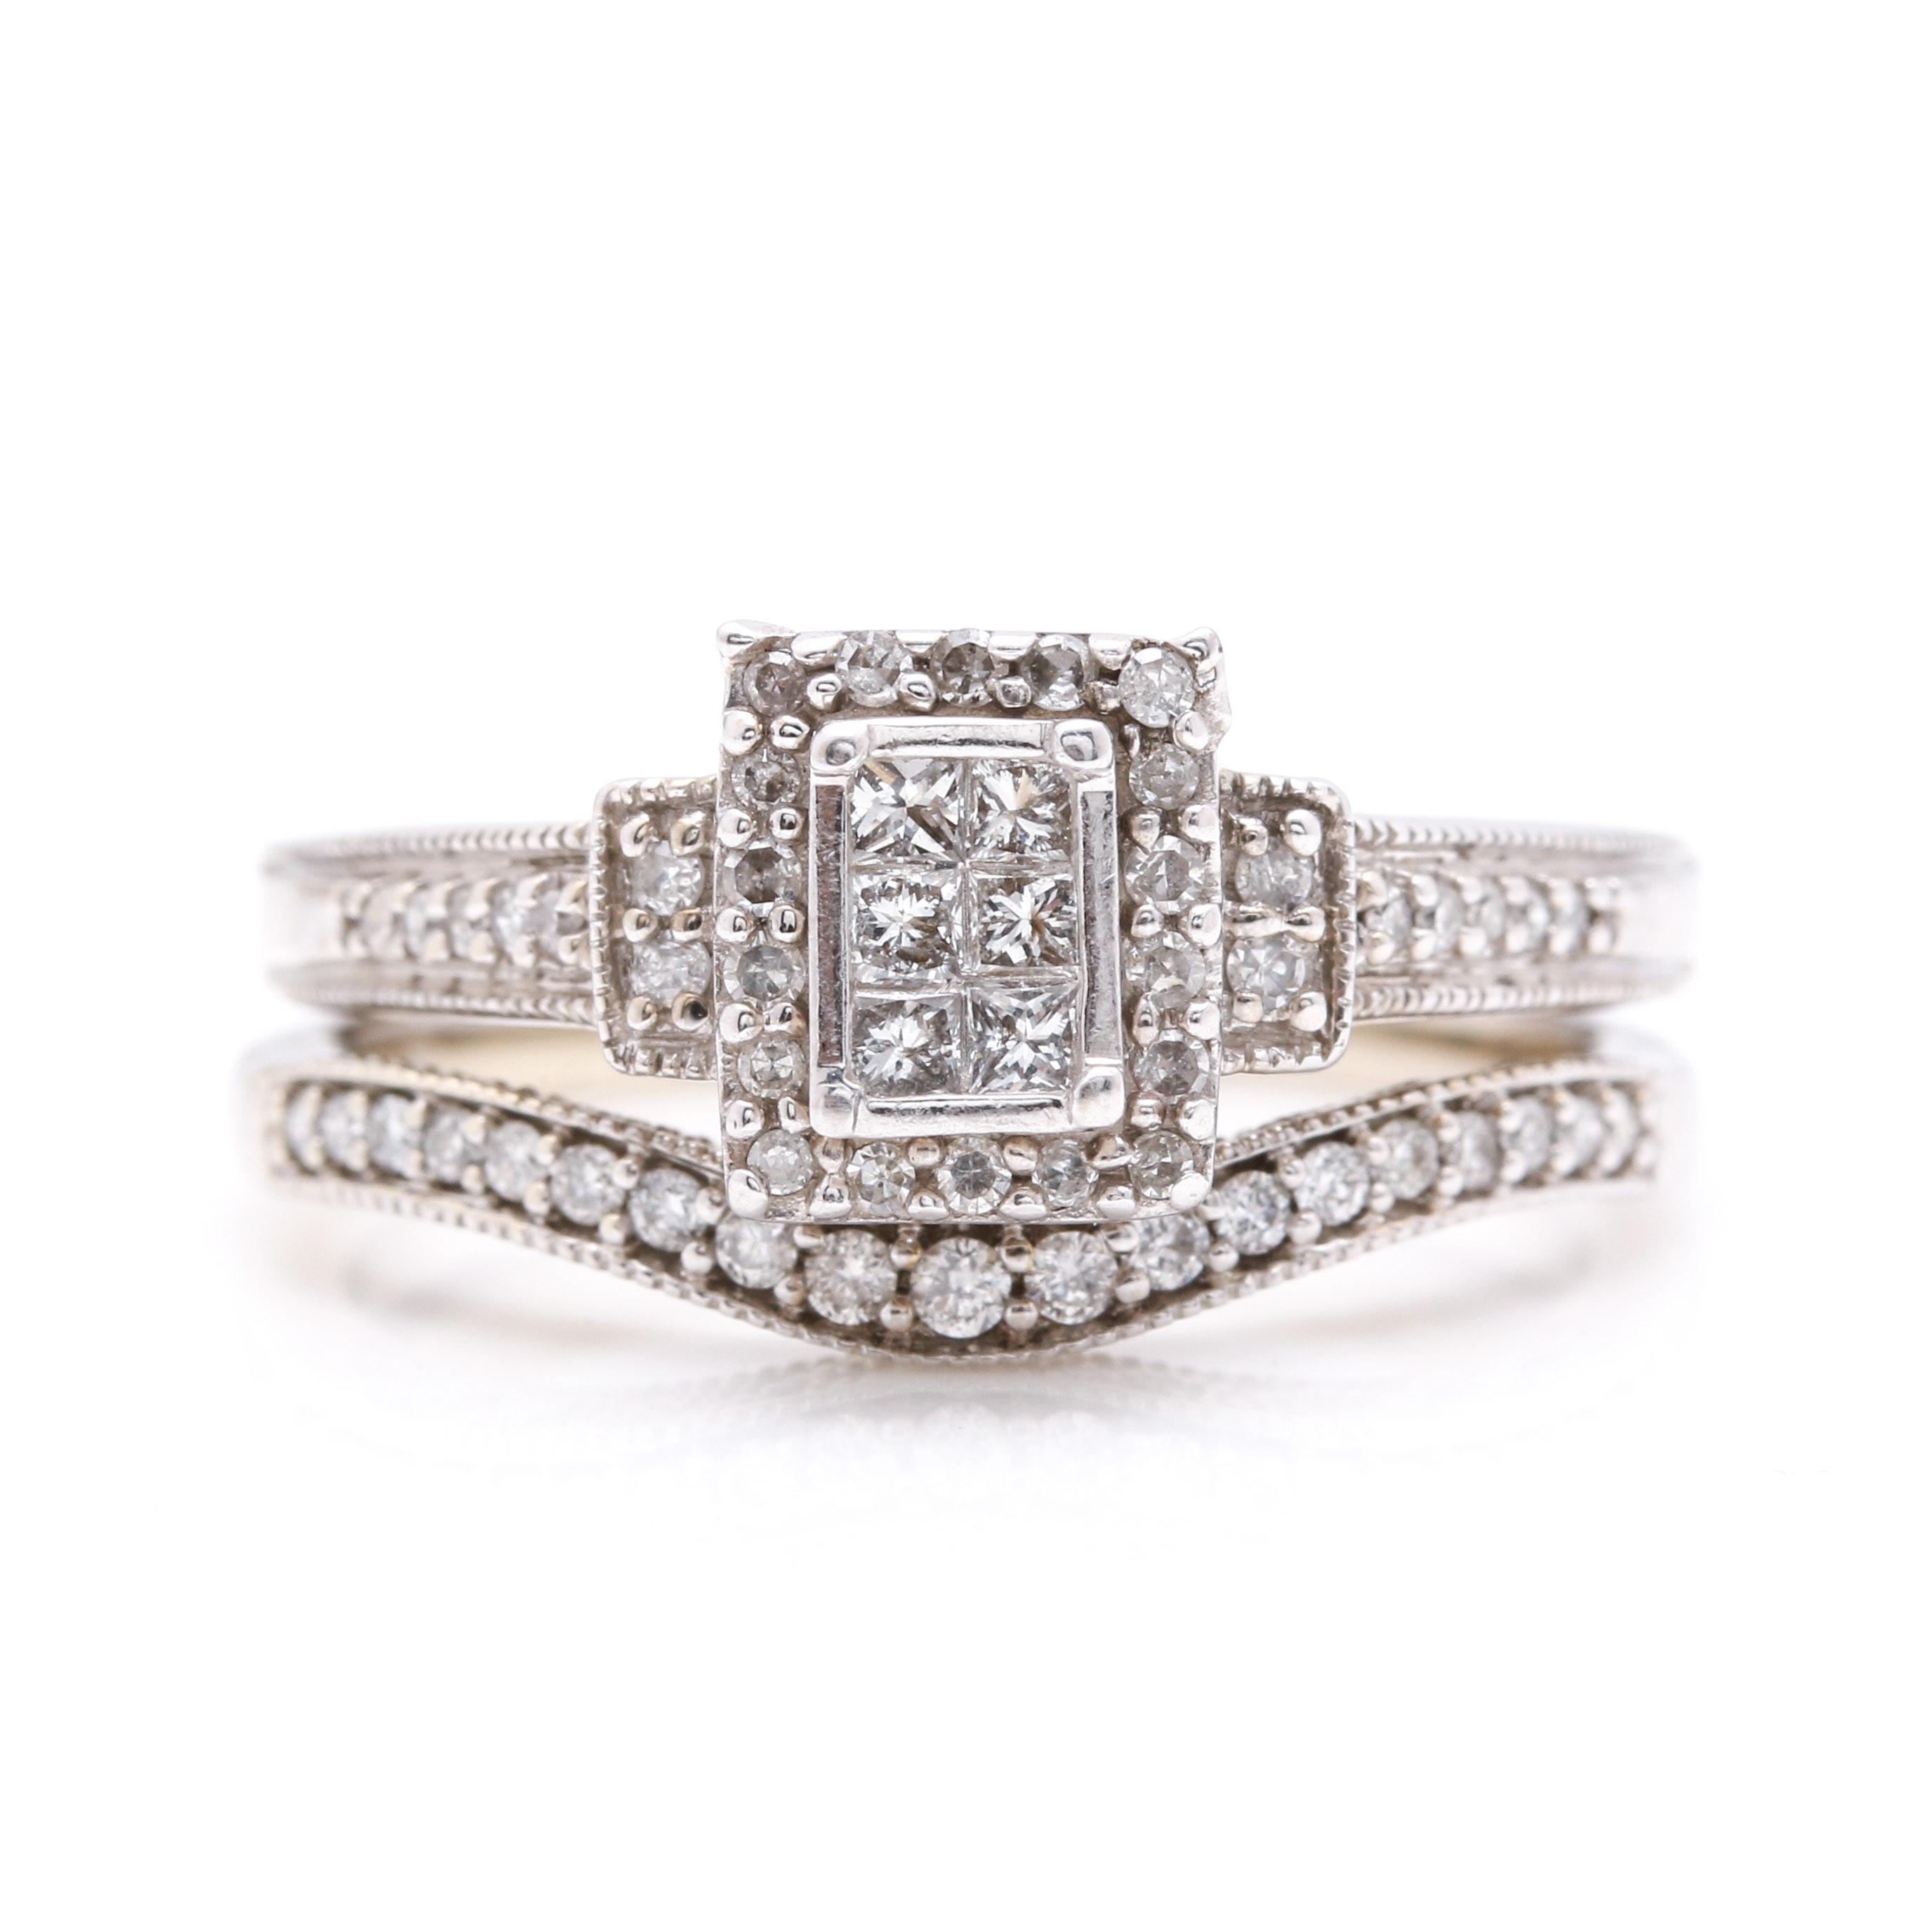 10K and 14K White Gold Diamond Wedding Ring Set